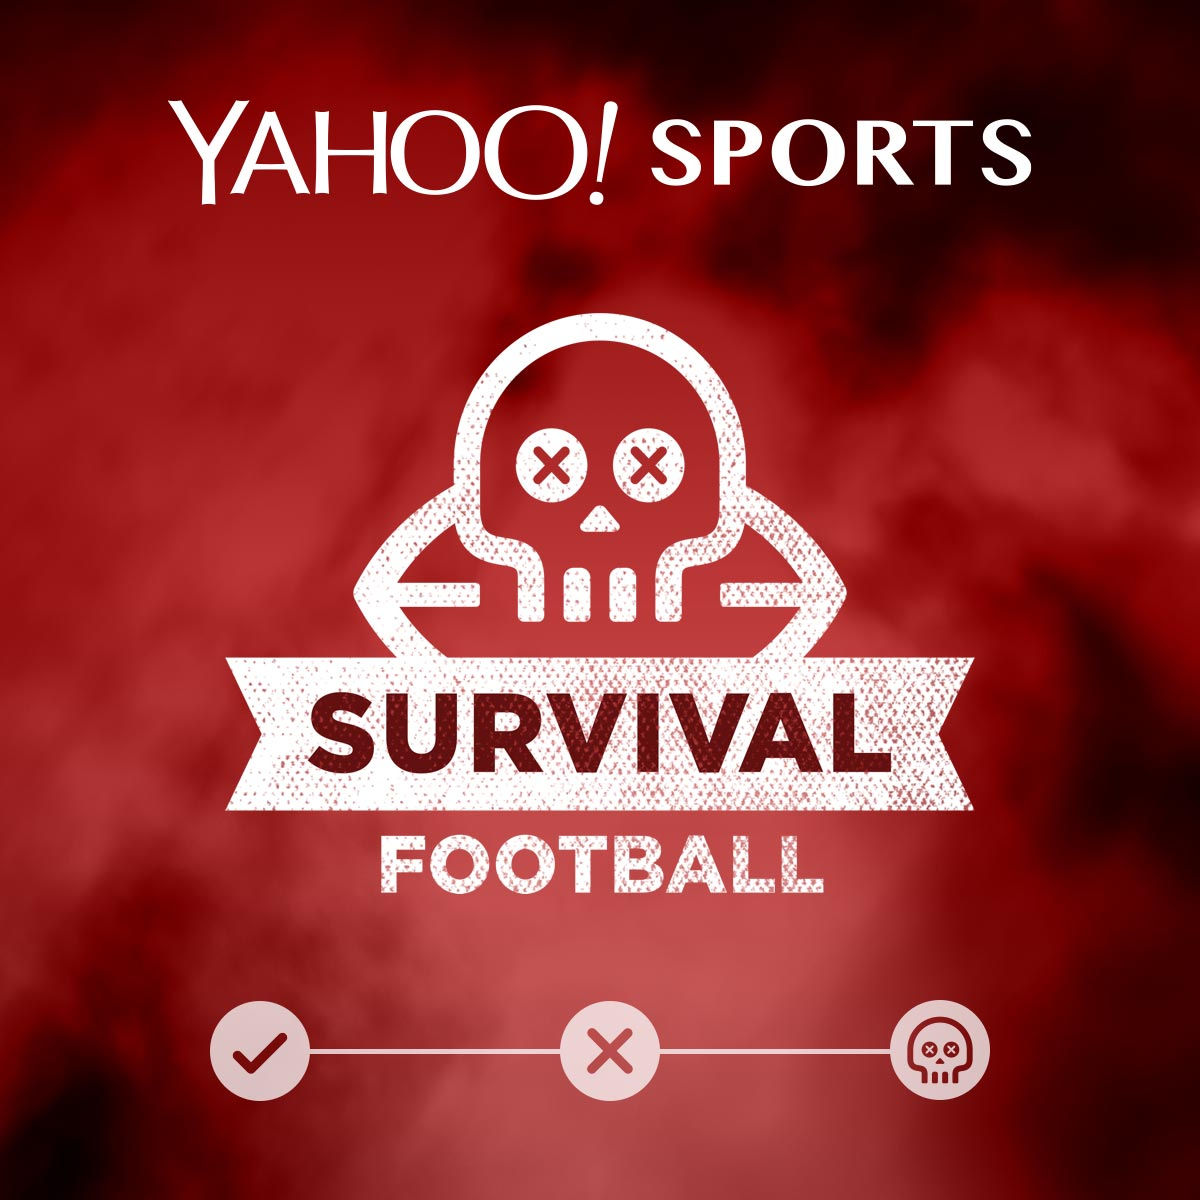 Survival Football | Yahoo Fantasy Sports